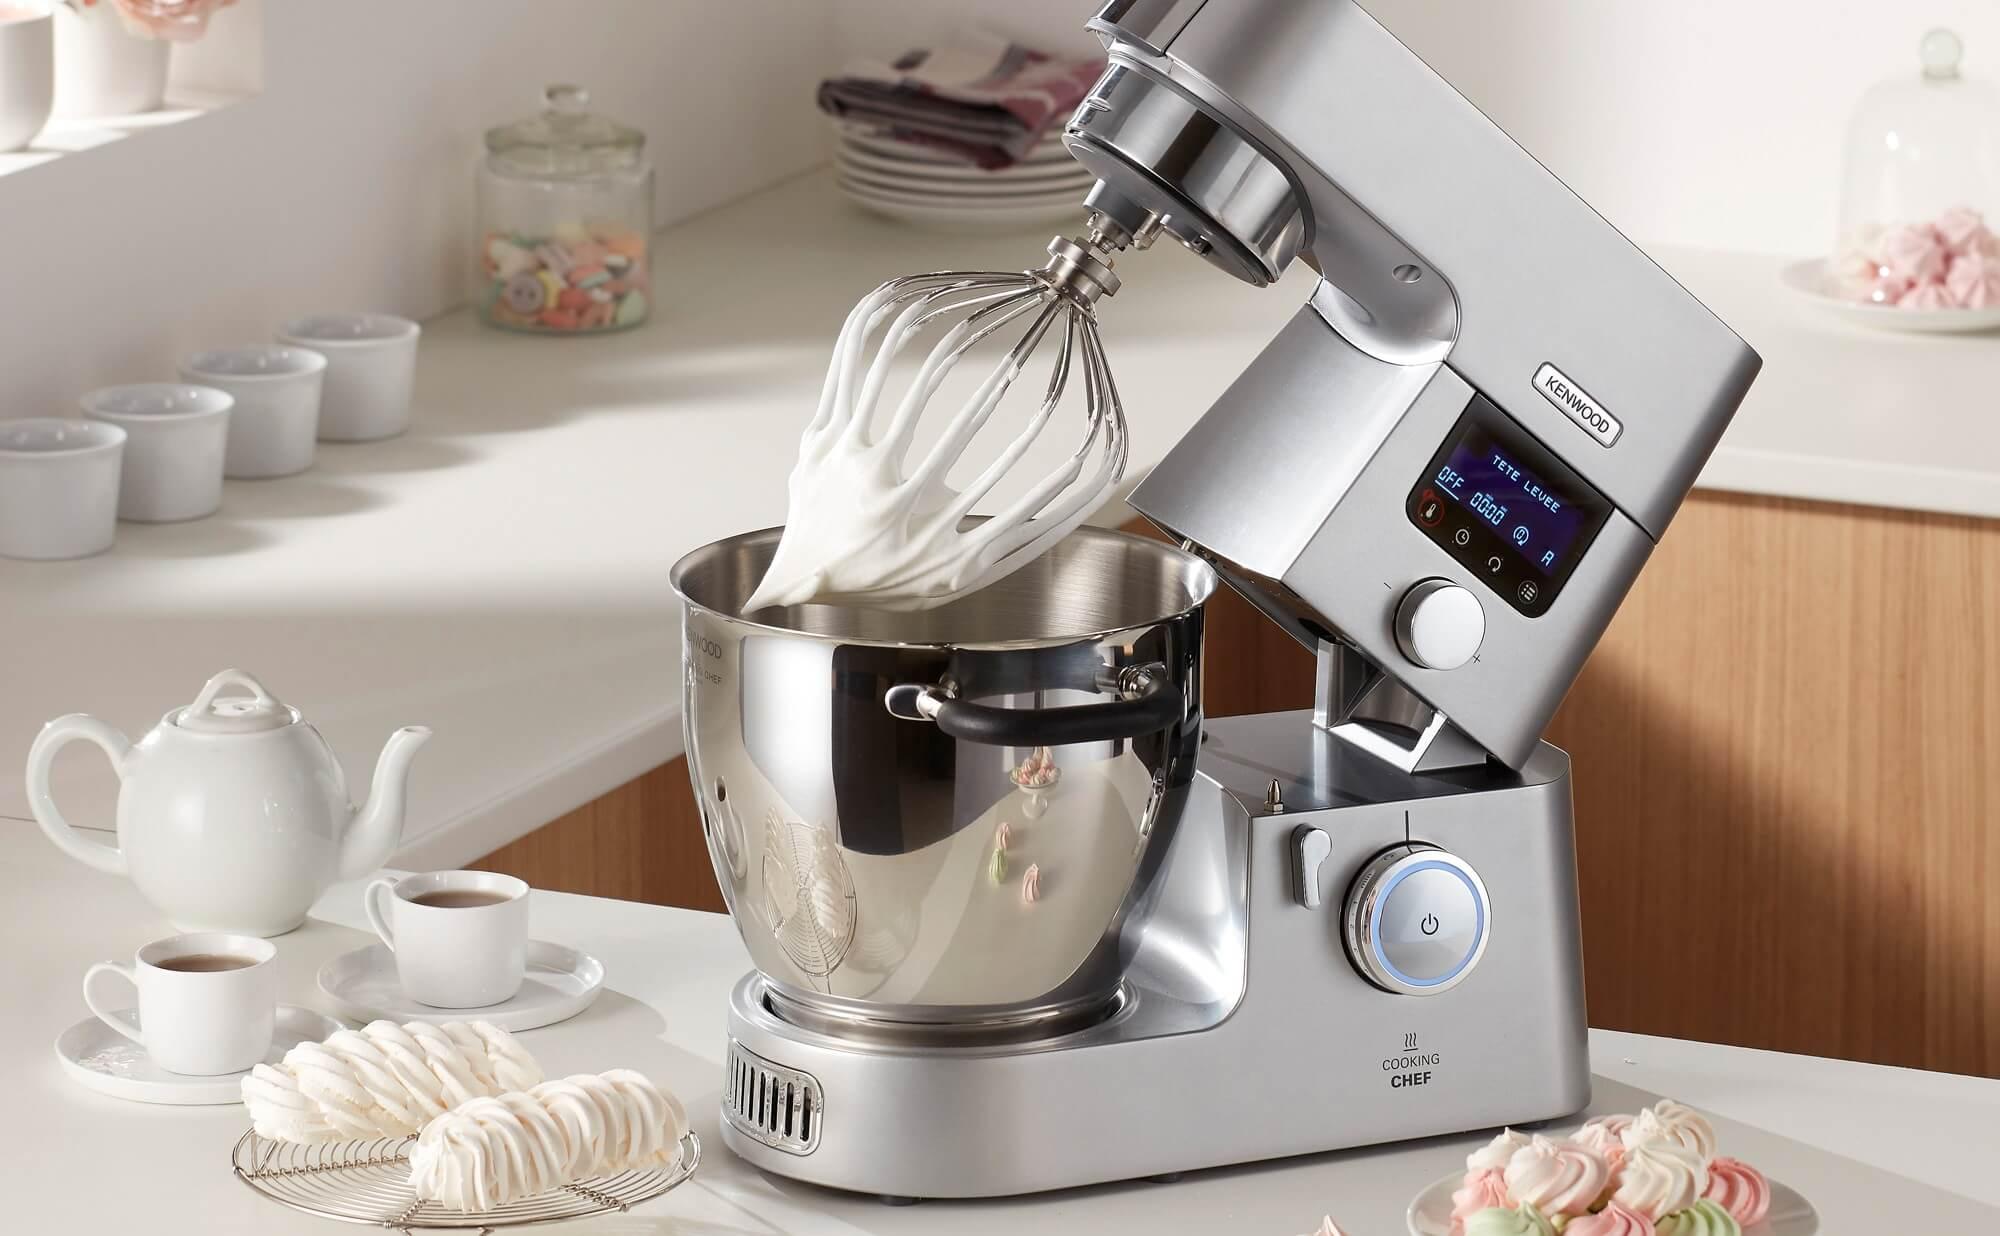 robot cuiseur multifonction robot pâtisserie Kenwood Cooking Chef gourmet test essai 2019